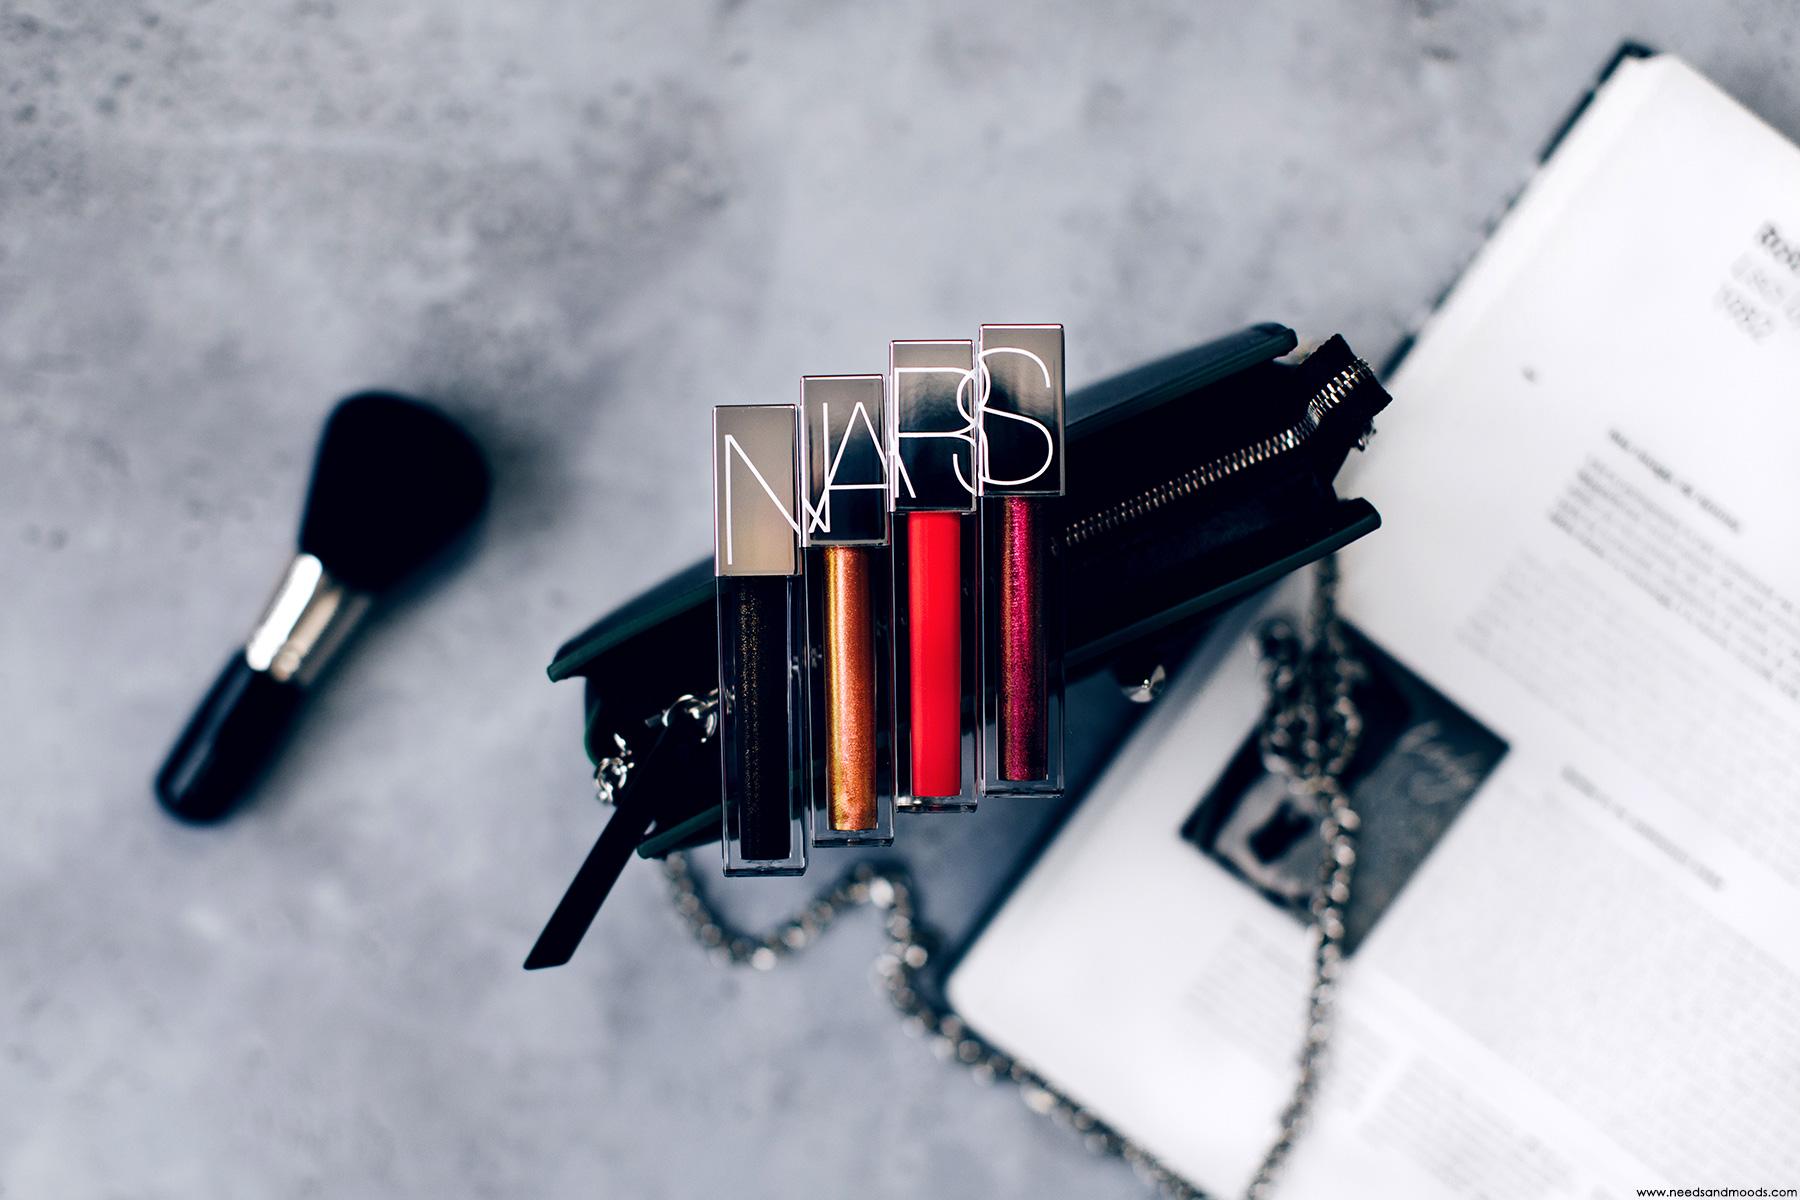 NARS full vinyl lip lacquer